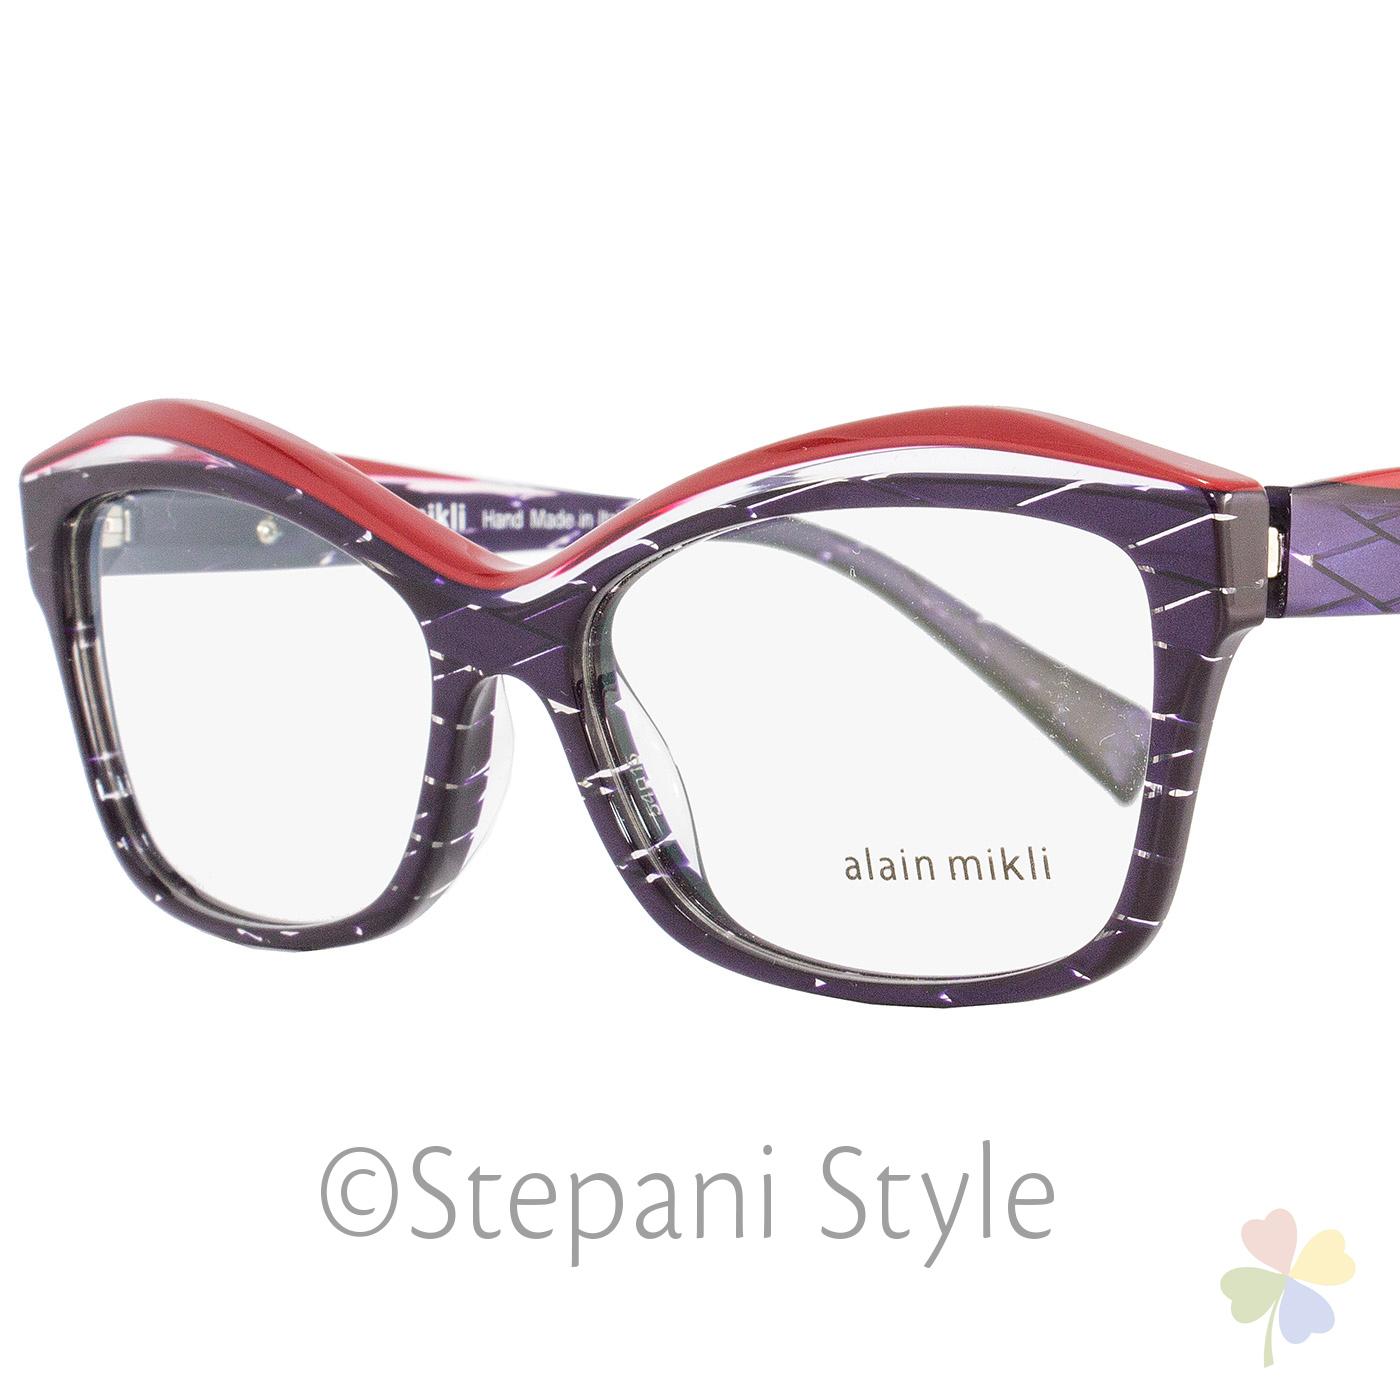 9b9226e320 Image is loading Alain-Mikli-Rectangular-Eyeglasses-A03042-R891-Size-54mm-